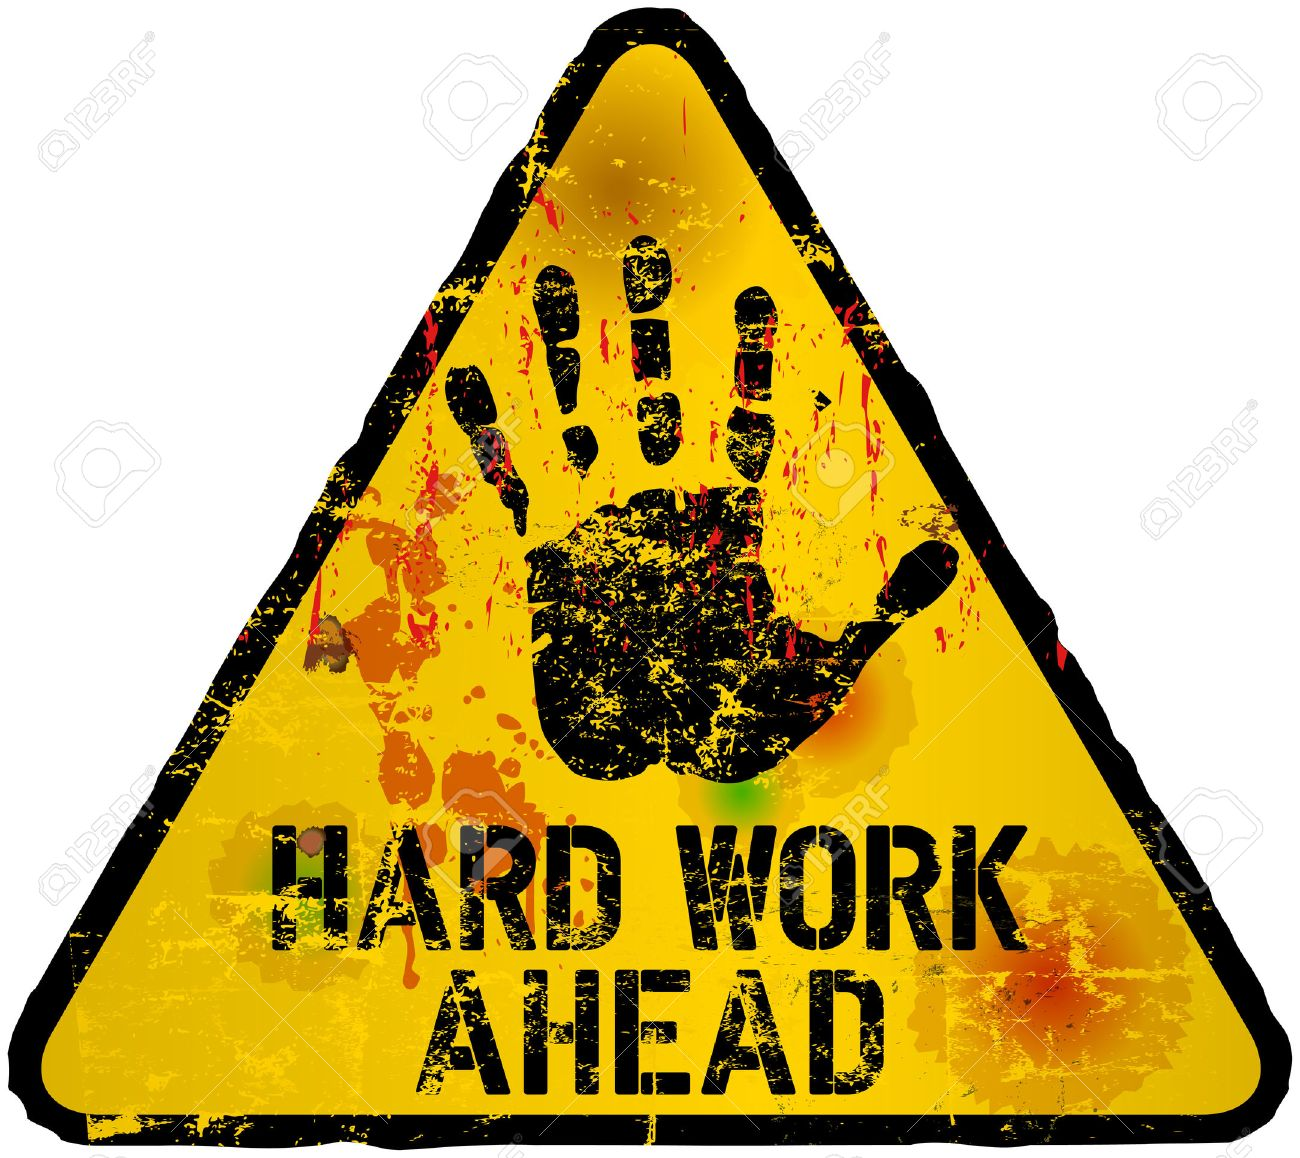 hard work ahead sign, vector illustration, grunge style - 30488666